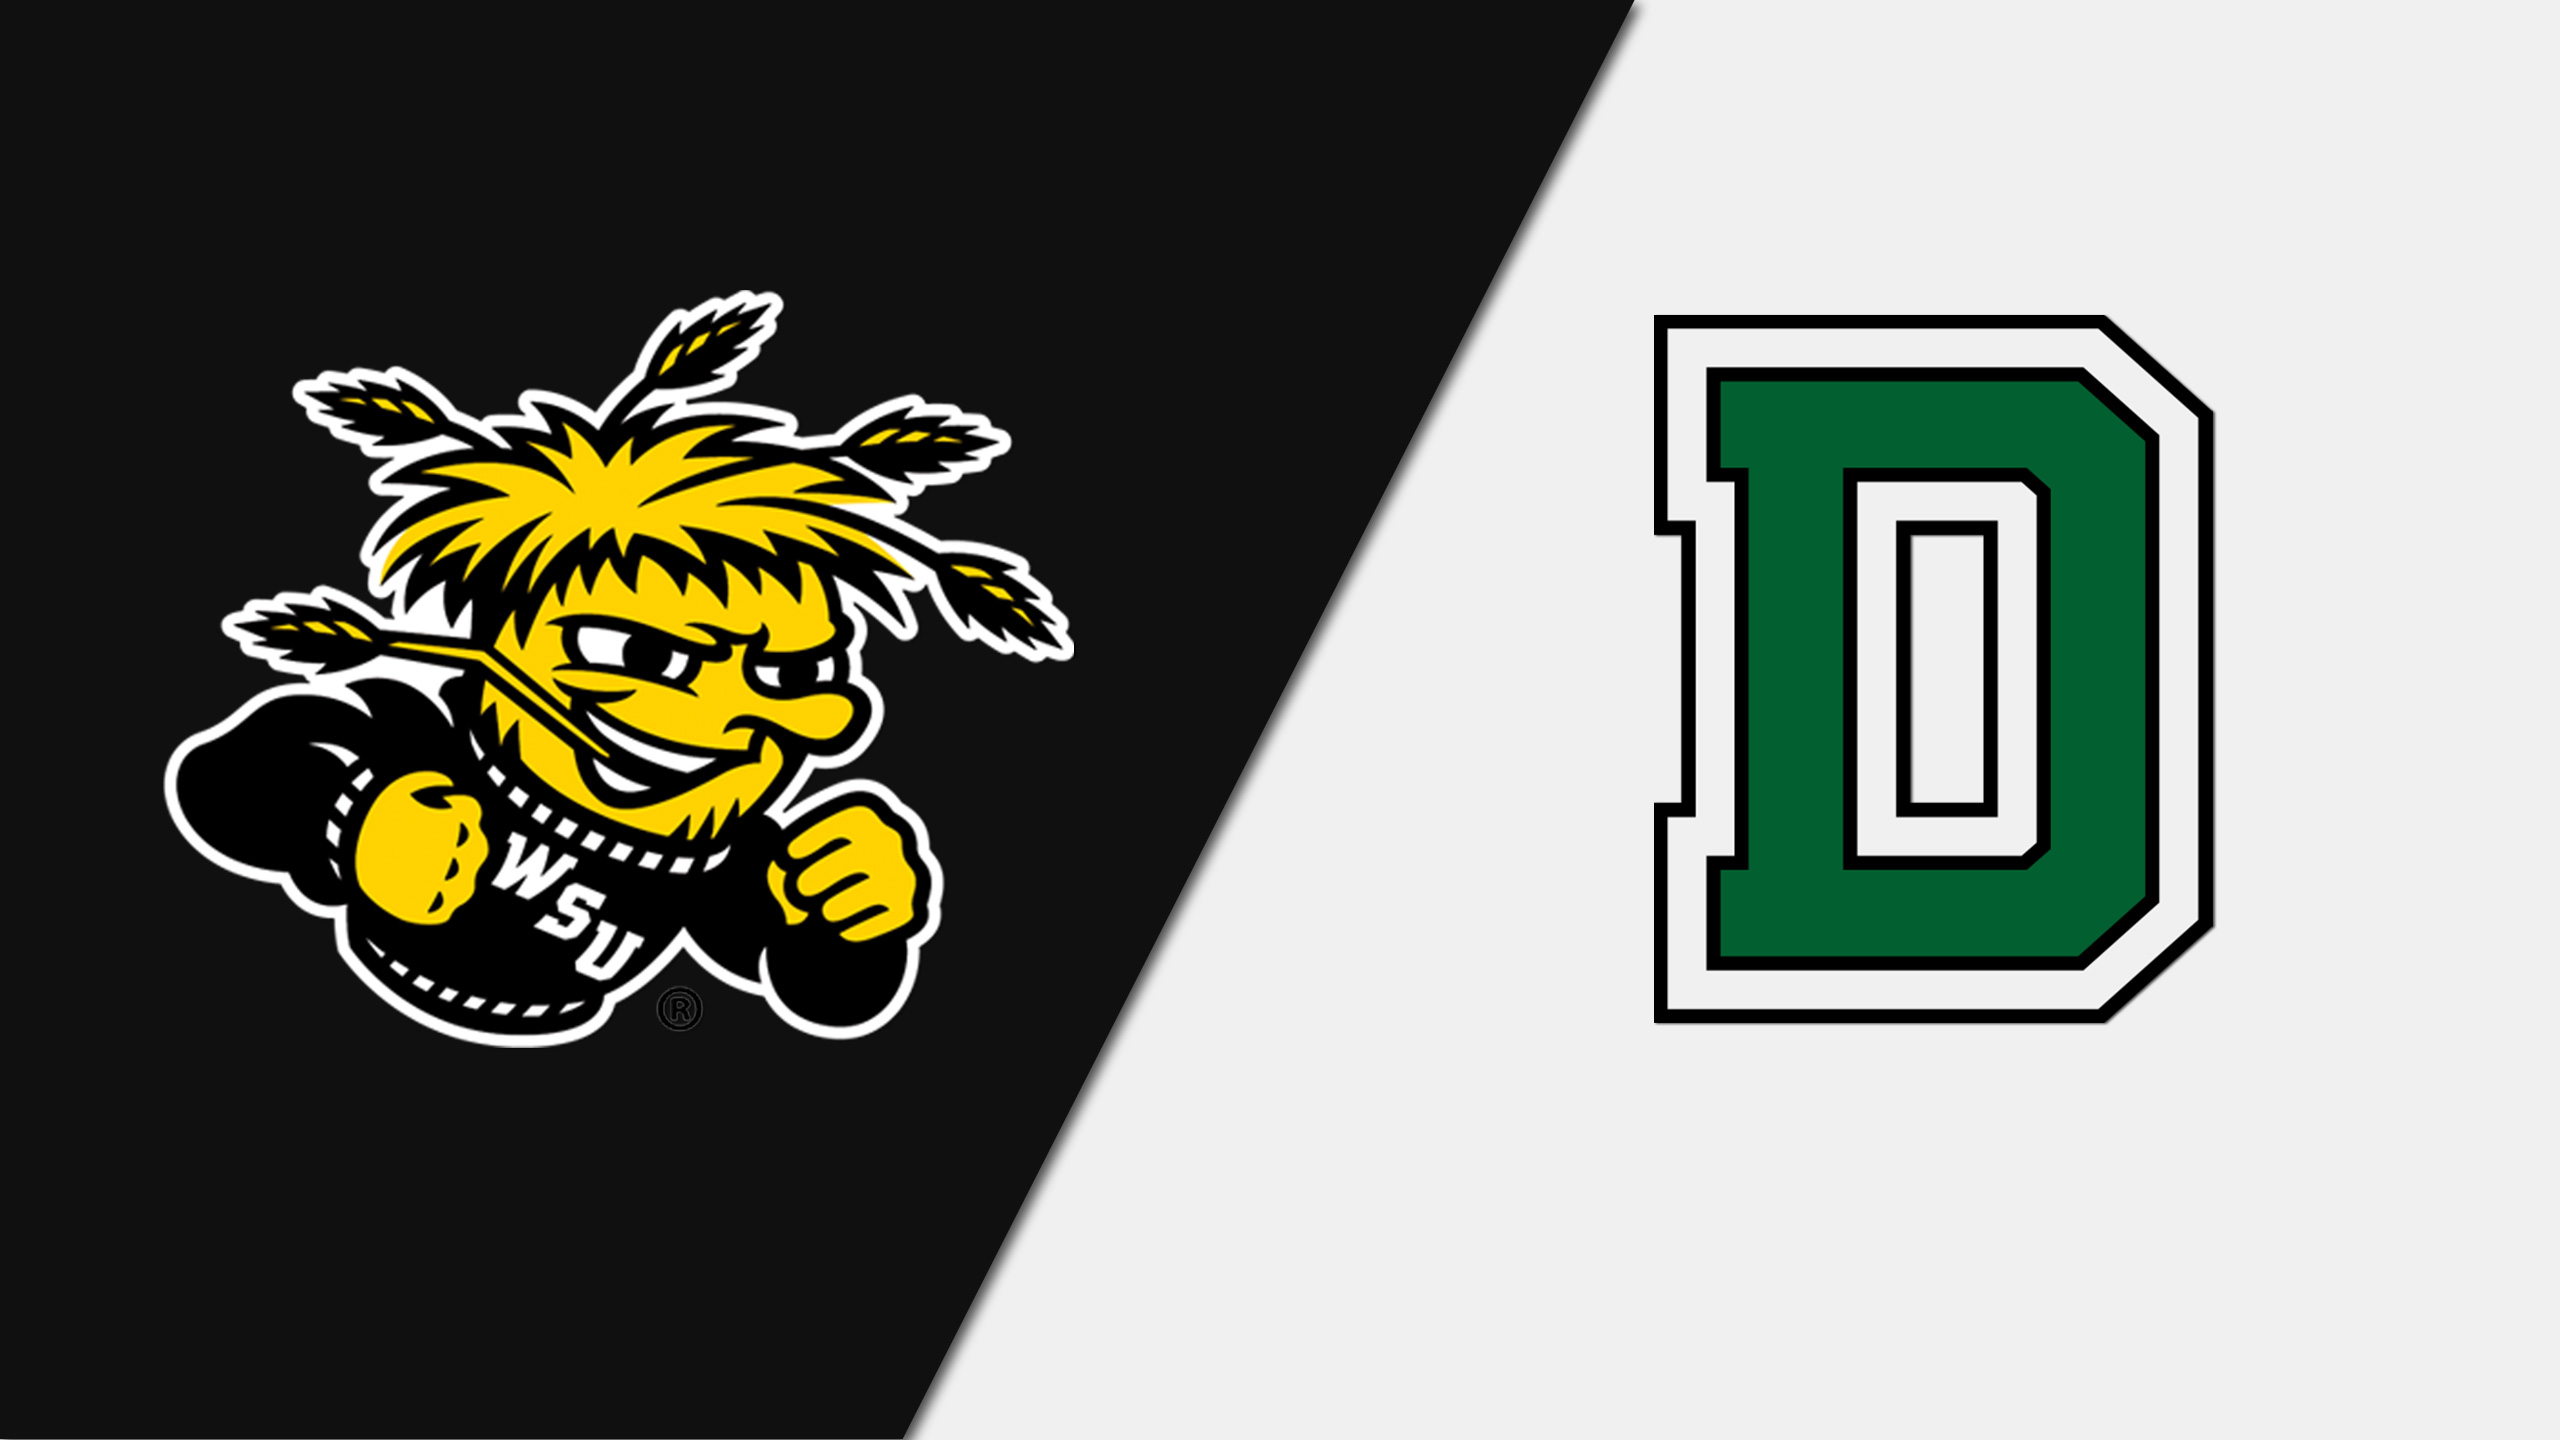 Wichita State vs. Dartmouth (Court 3)